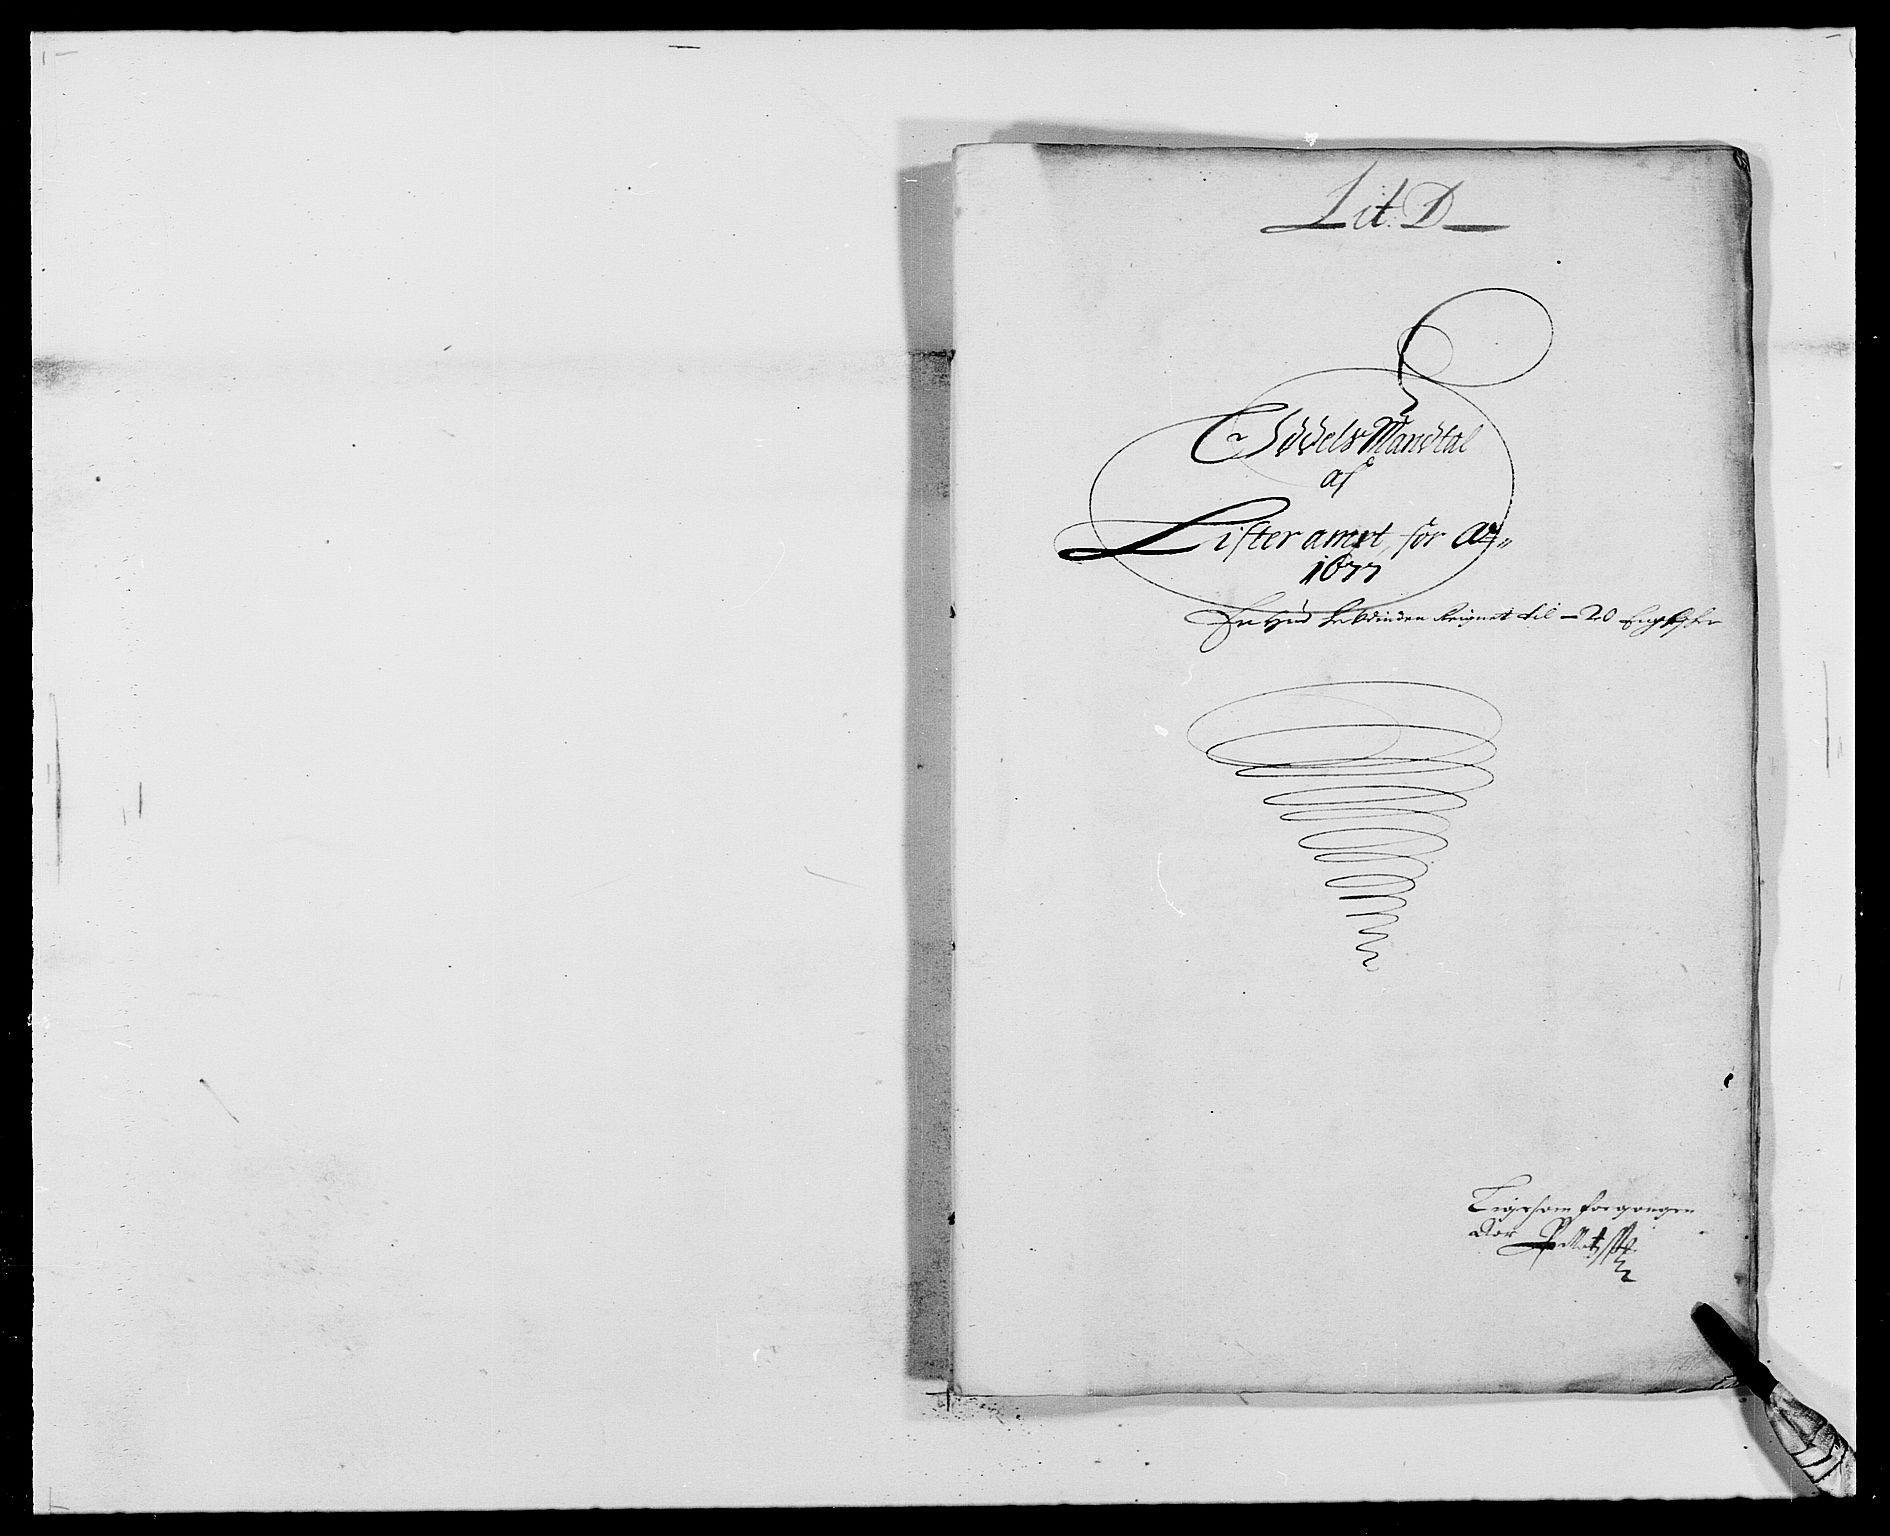 RA, Rentekammeret inntil 1814, Reviderte regnskaper, Fogderegnskap, R41/L2530: Fogderegnskap Lista, 1677-1679, s. 74